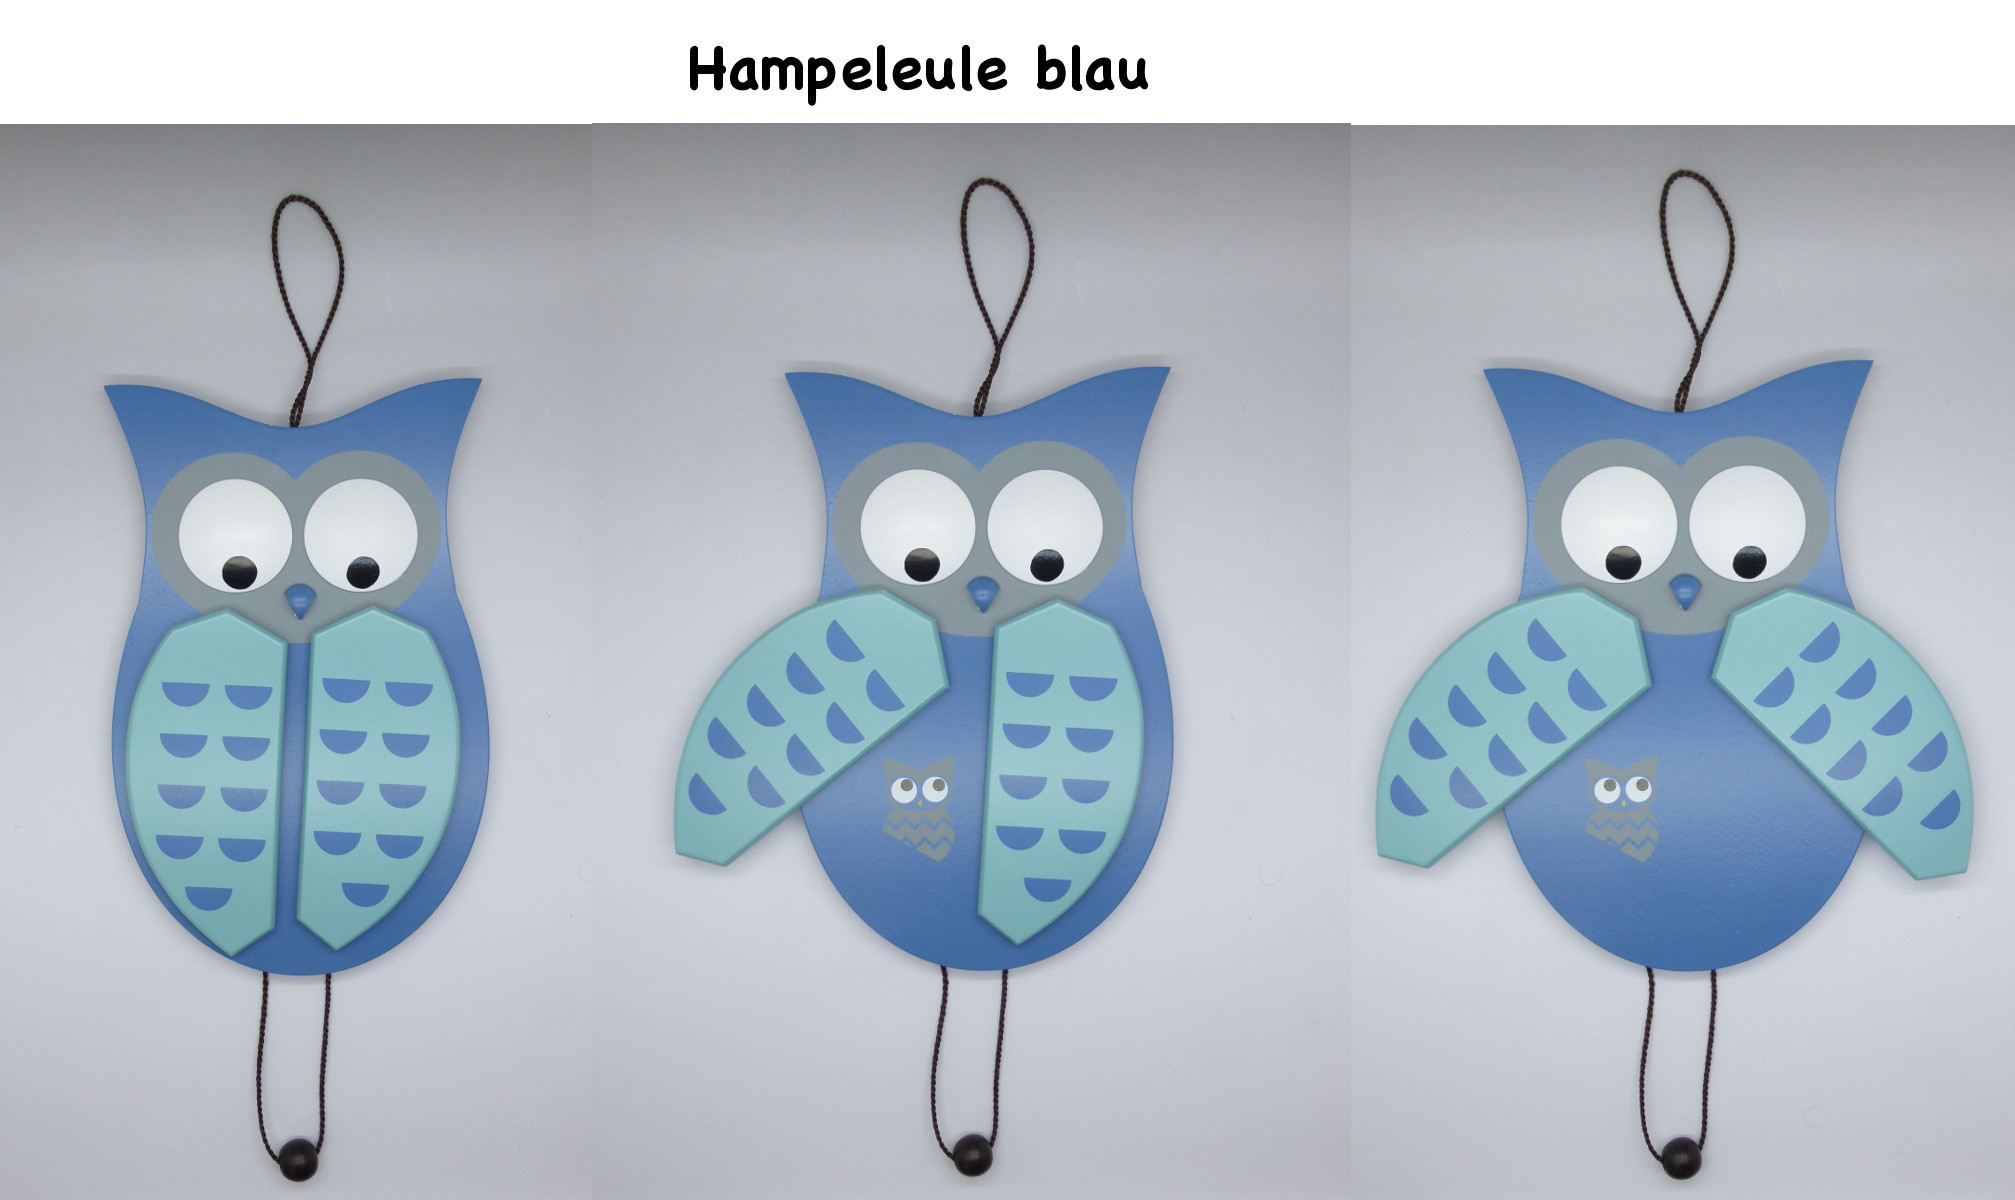 Hampeleule_blau_Gruppenfoto